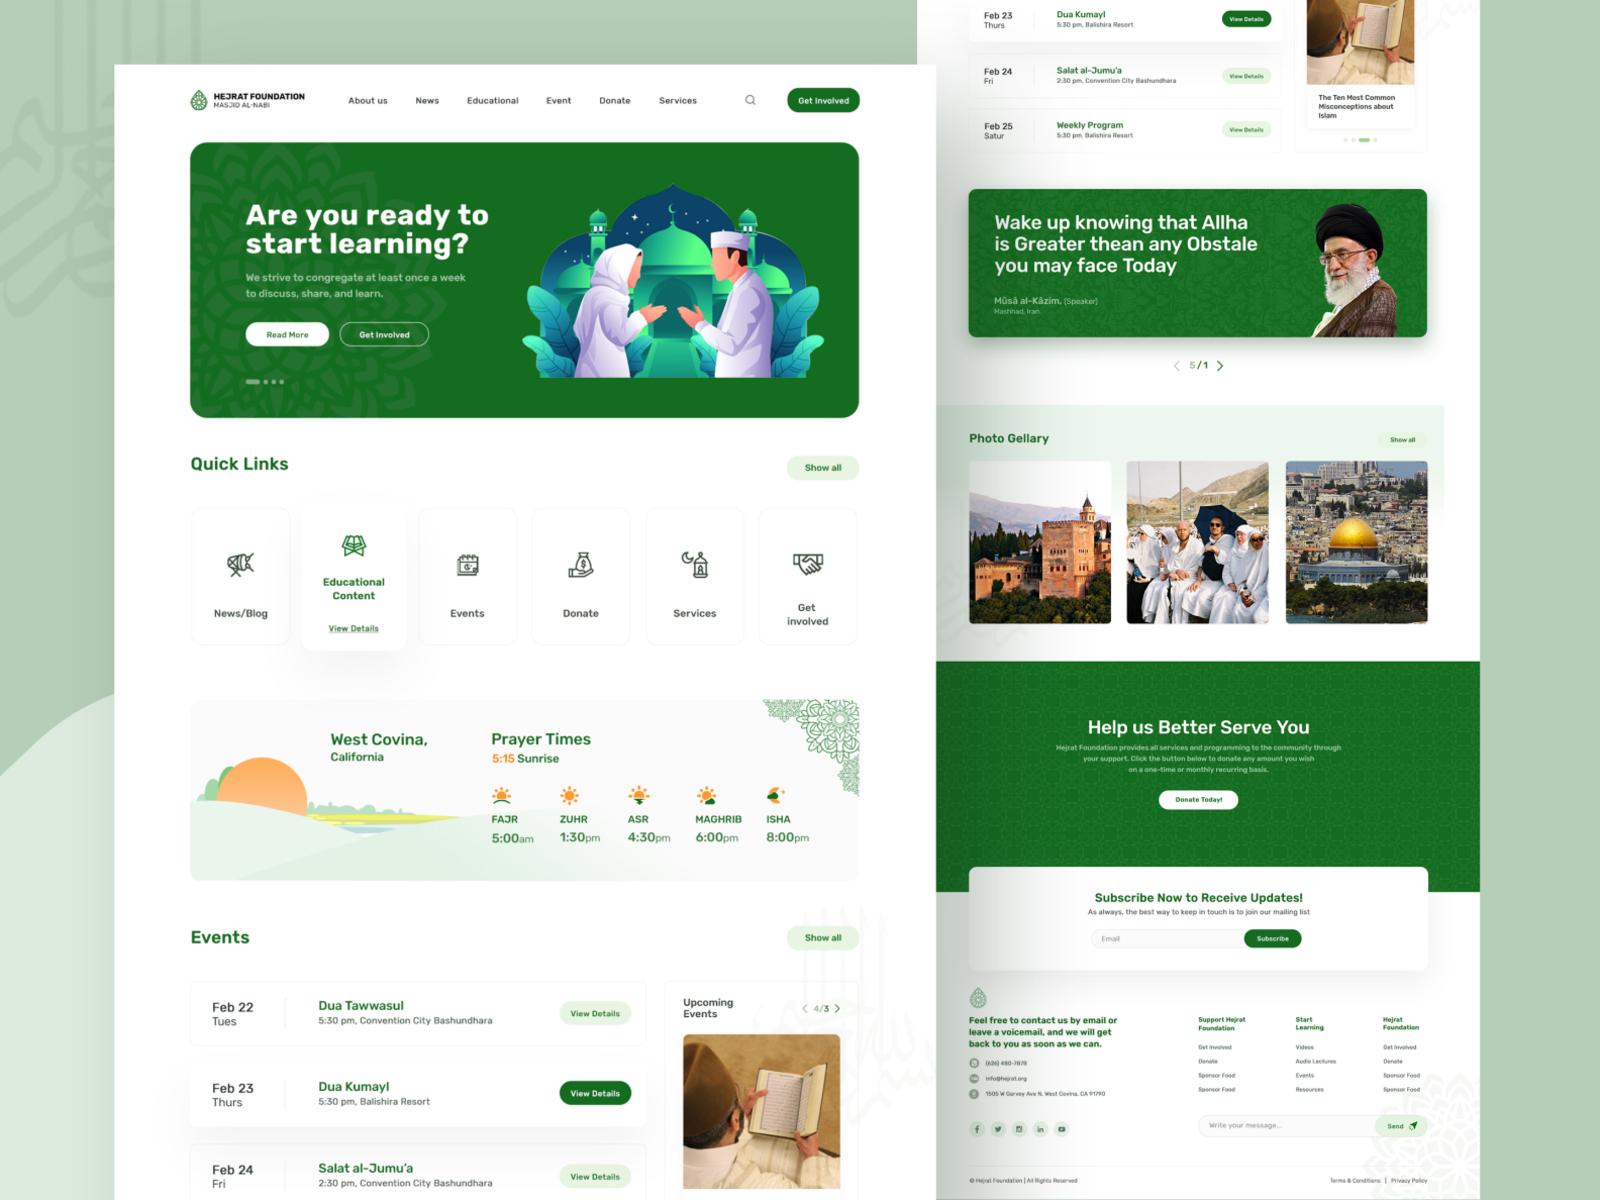 Hejrat Foundation website